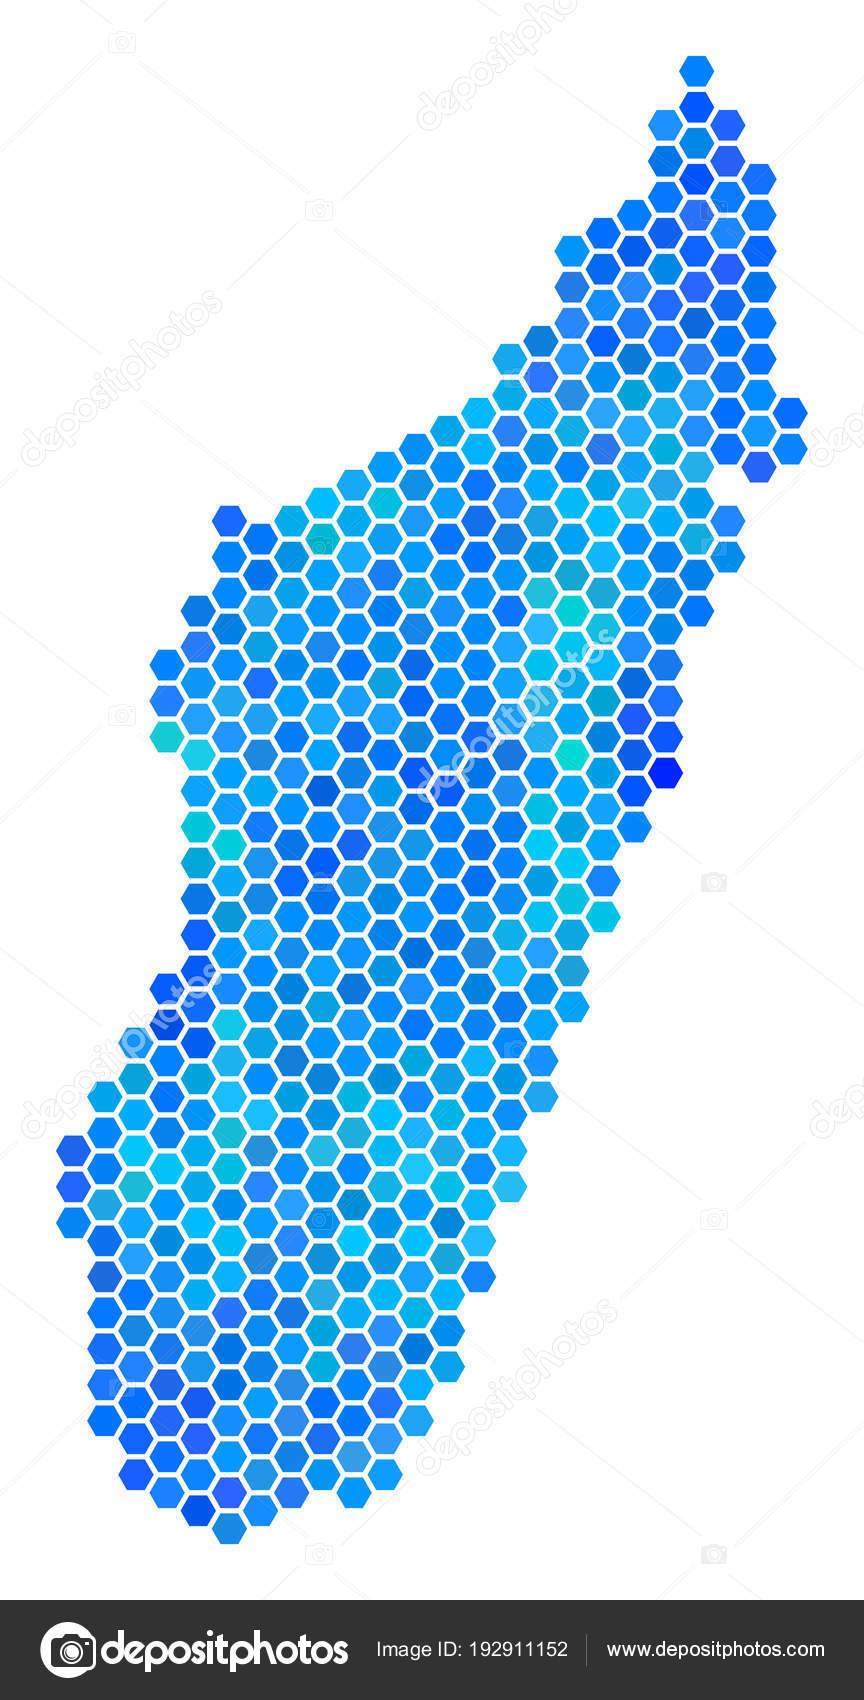 Isla De Madagascar Mapa.Mapa De La Isla De Madagascar De Hexagono Azul Vector De